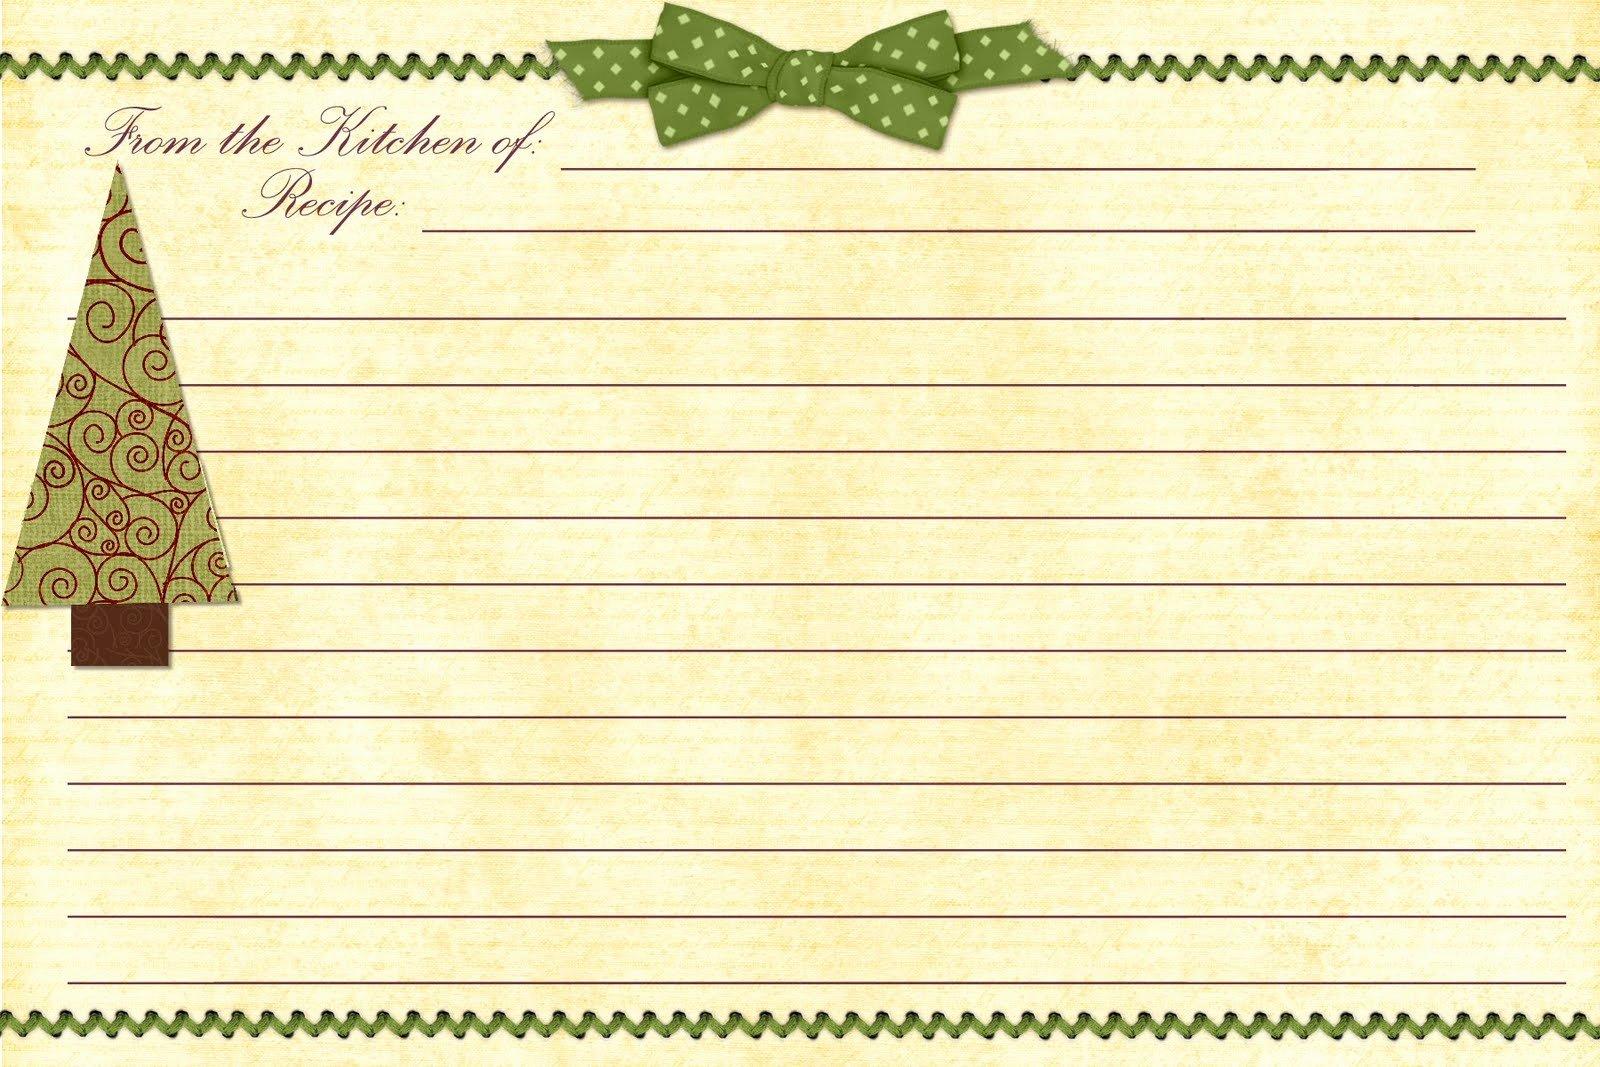 Christmas Recipe Card Template Elegant 8 Best Of Free Editable Printable Recipe Cards